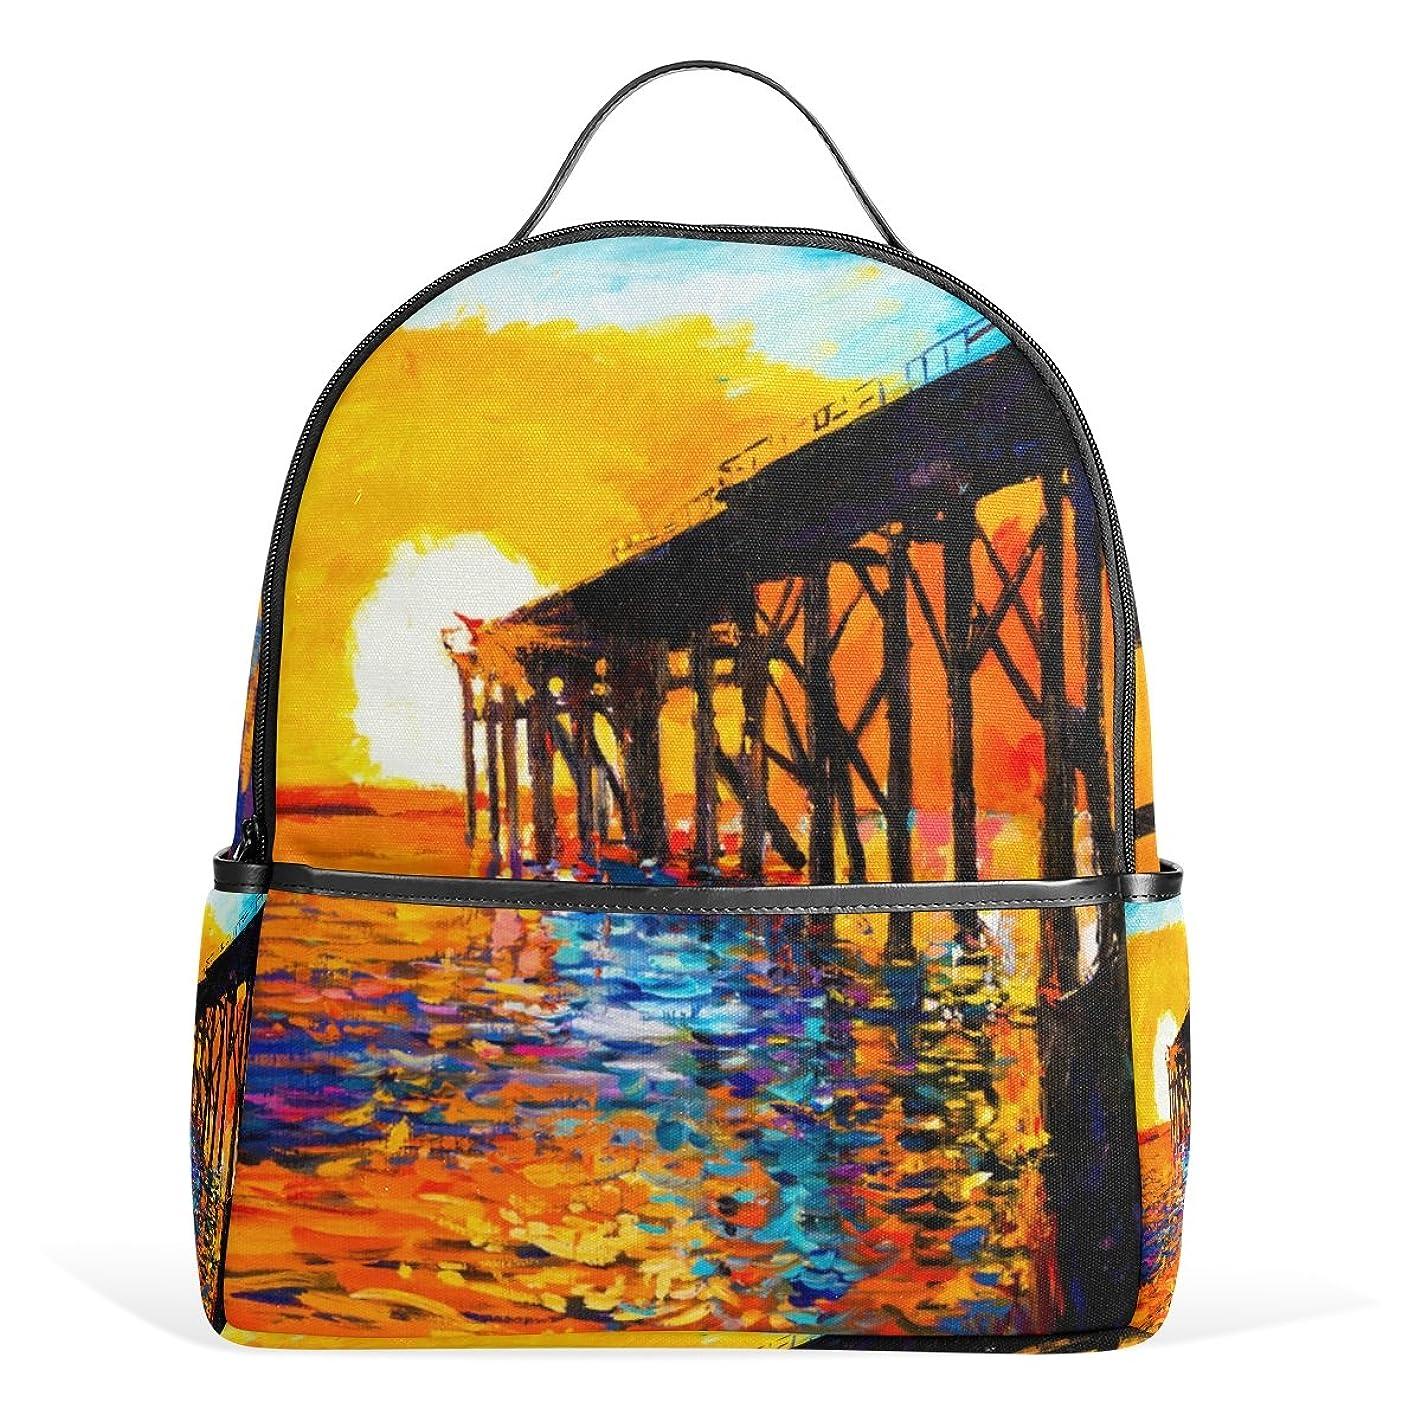 My Daily Sea Bridge Sunset Oil Painting Backpack School Bookbag Casual Daypack